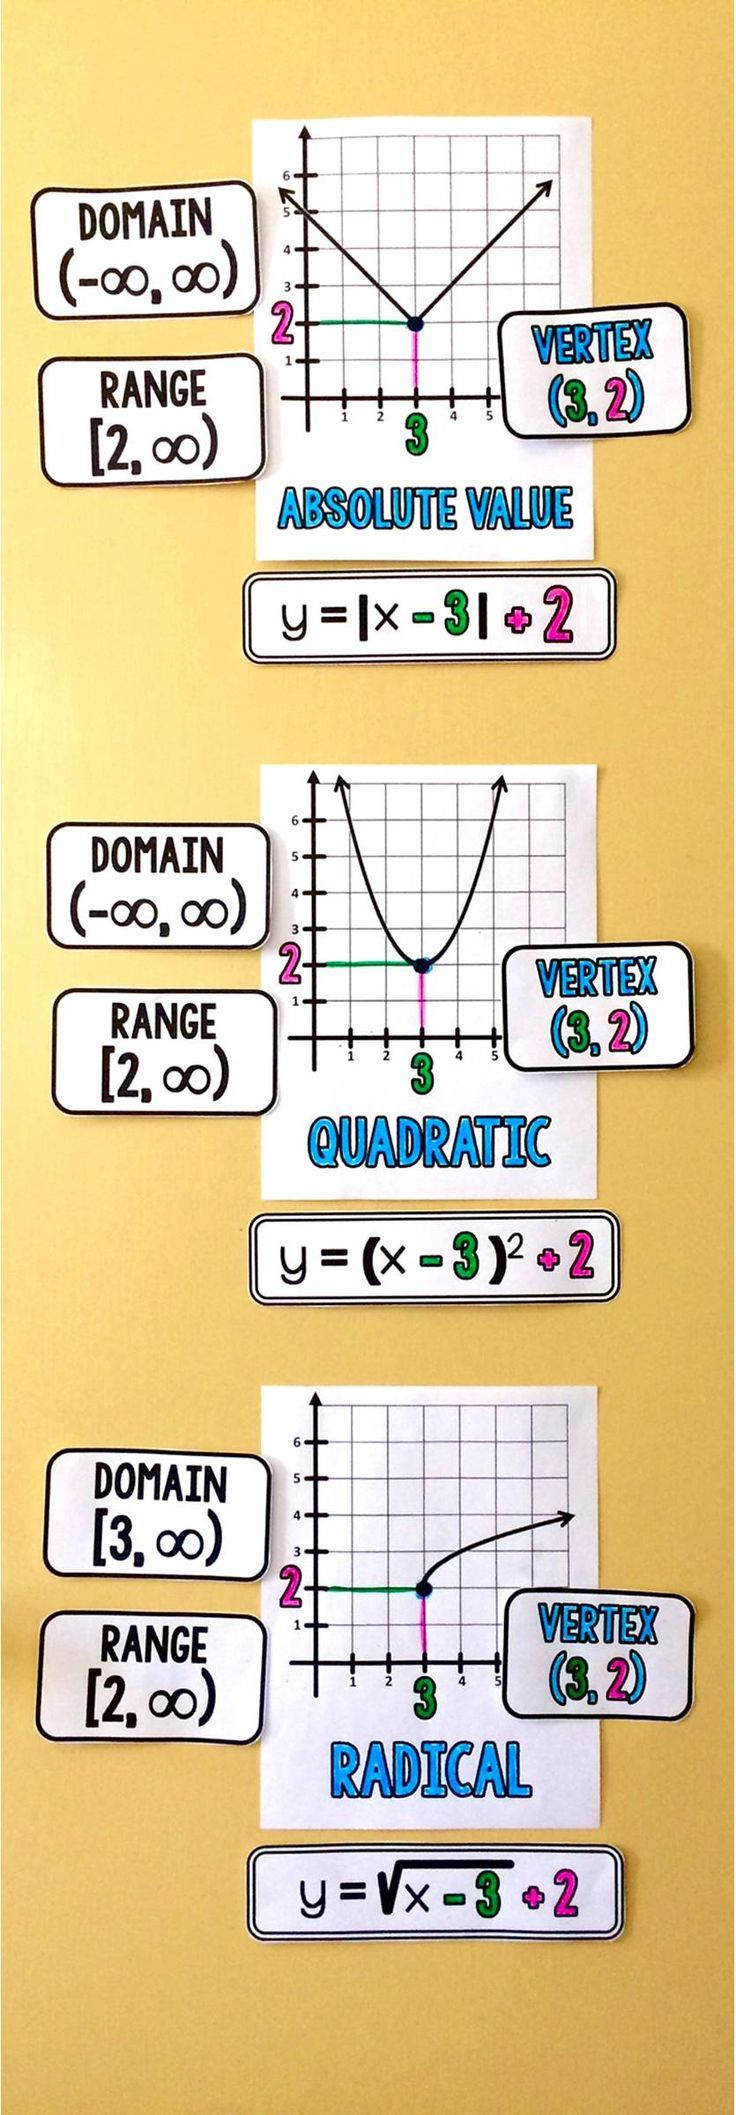 20 best Math Confidence images on Pinterest | Classroom ideas ...